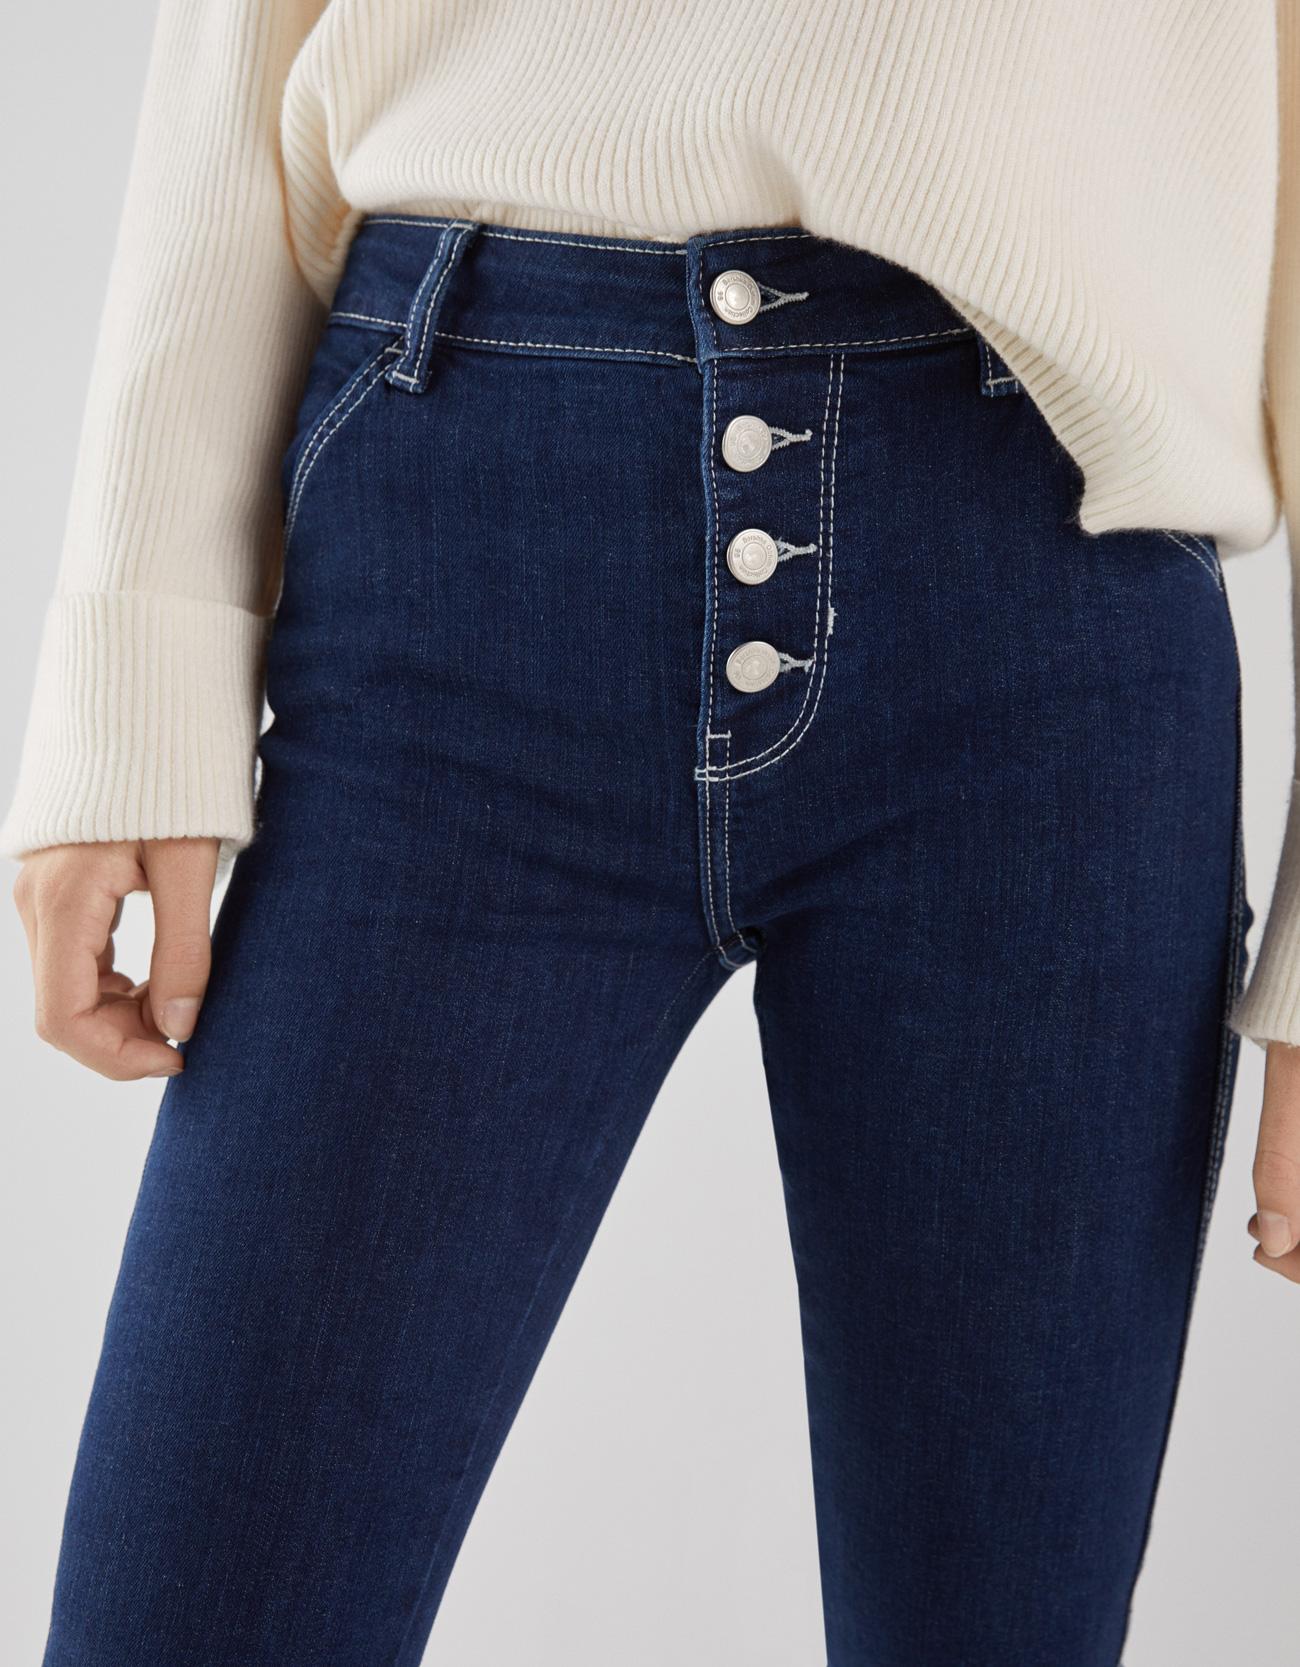 5bd874c3a56 Jeans Skinny Mid Rise con botones - Novedades - Bershka Mexico